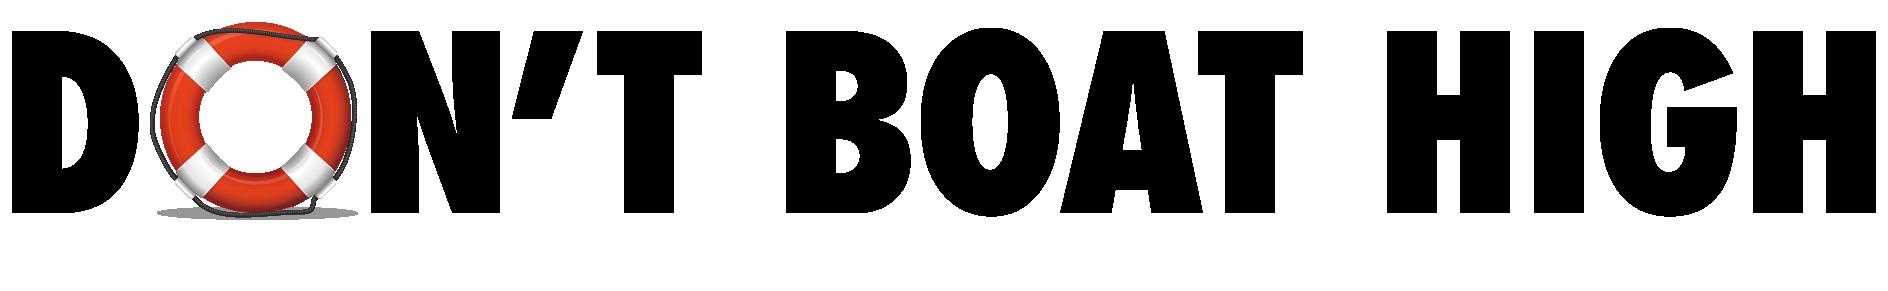 Skytsunami